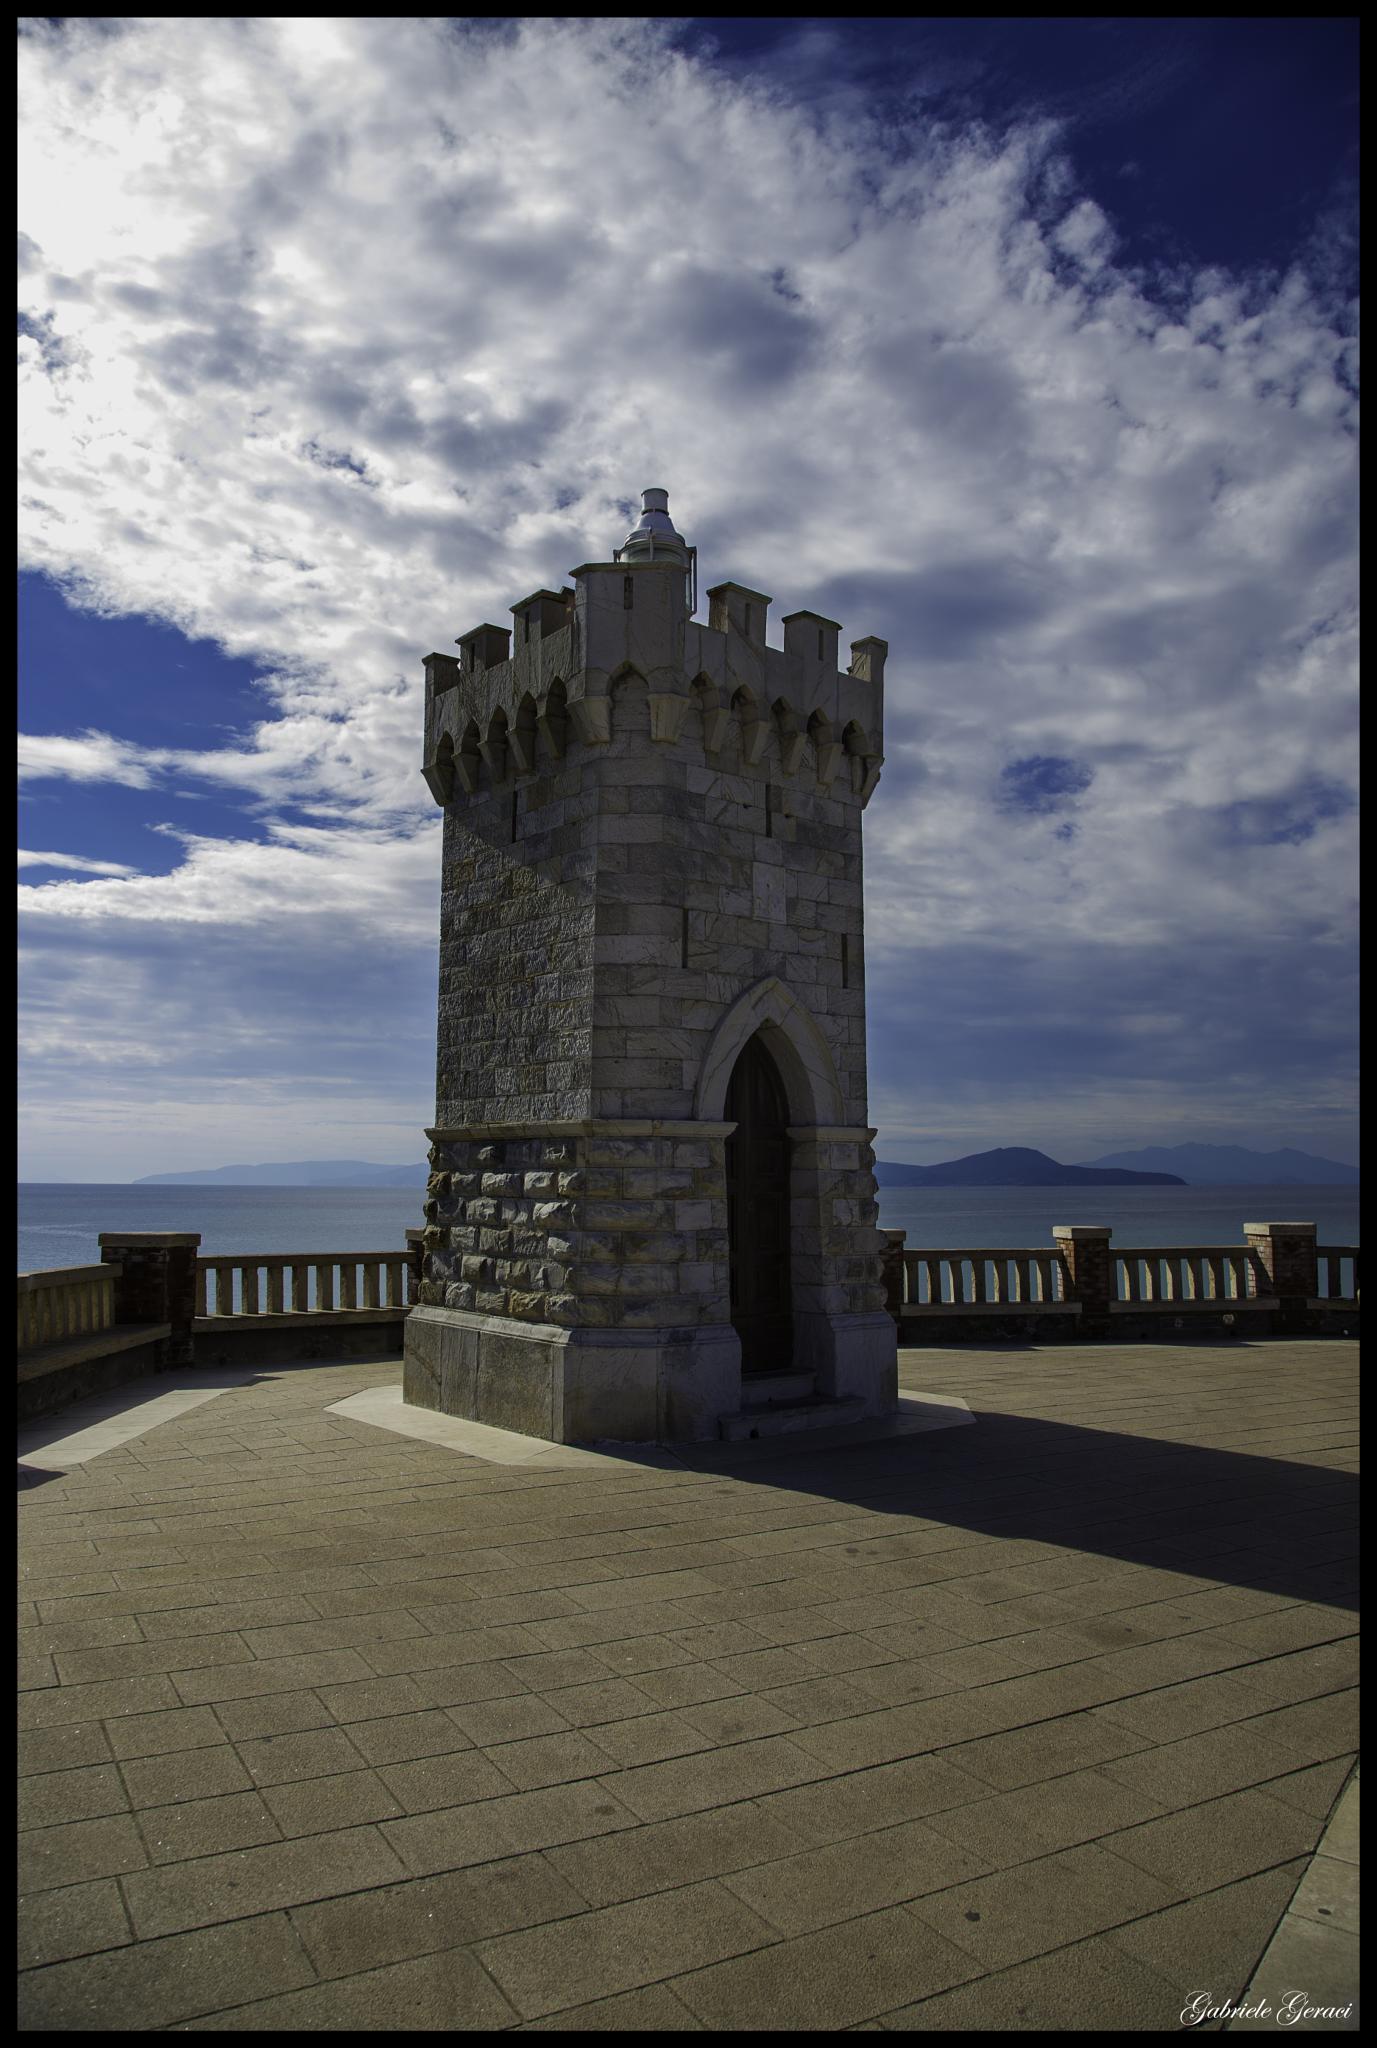 La piccola Torre by Gabriele Geraci